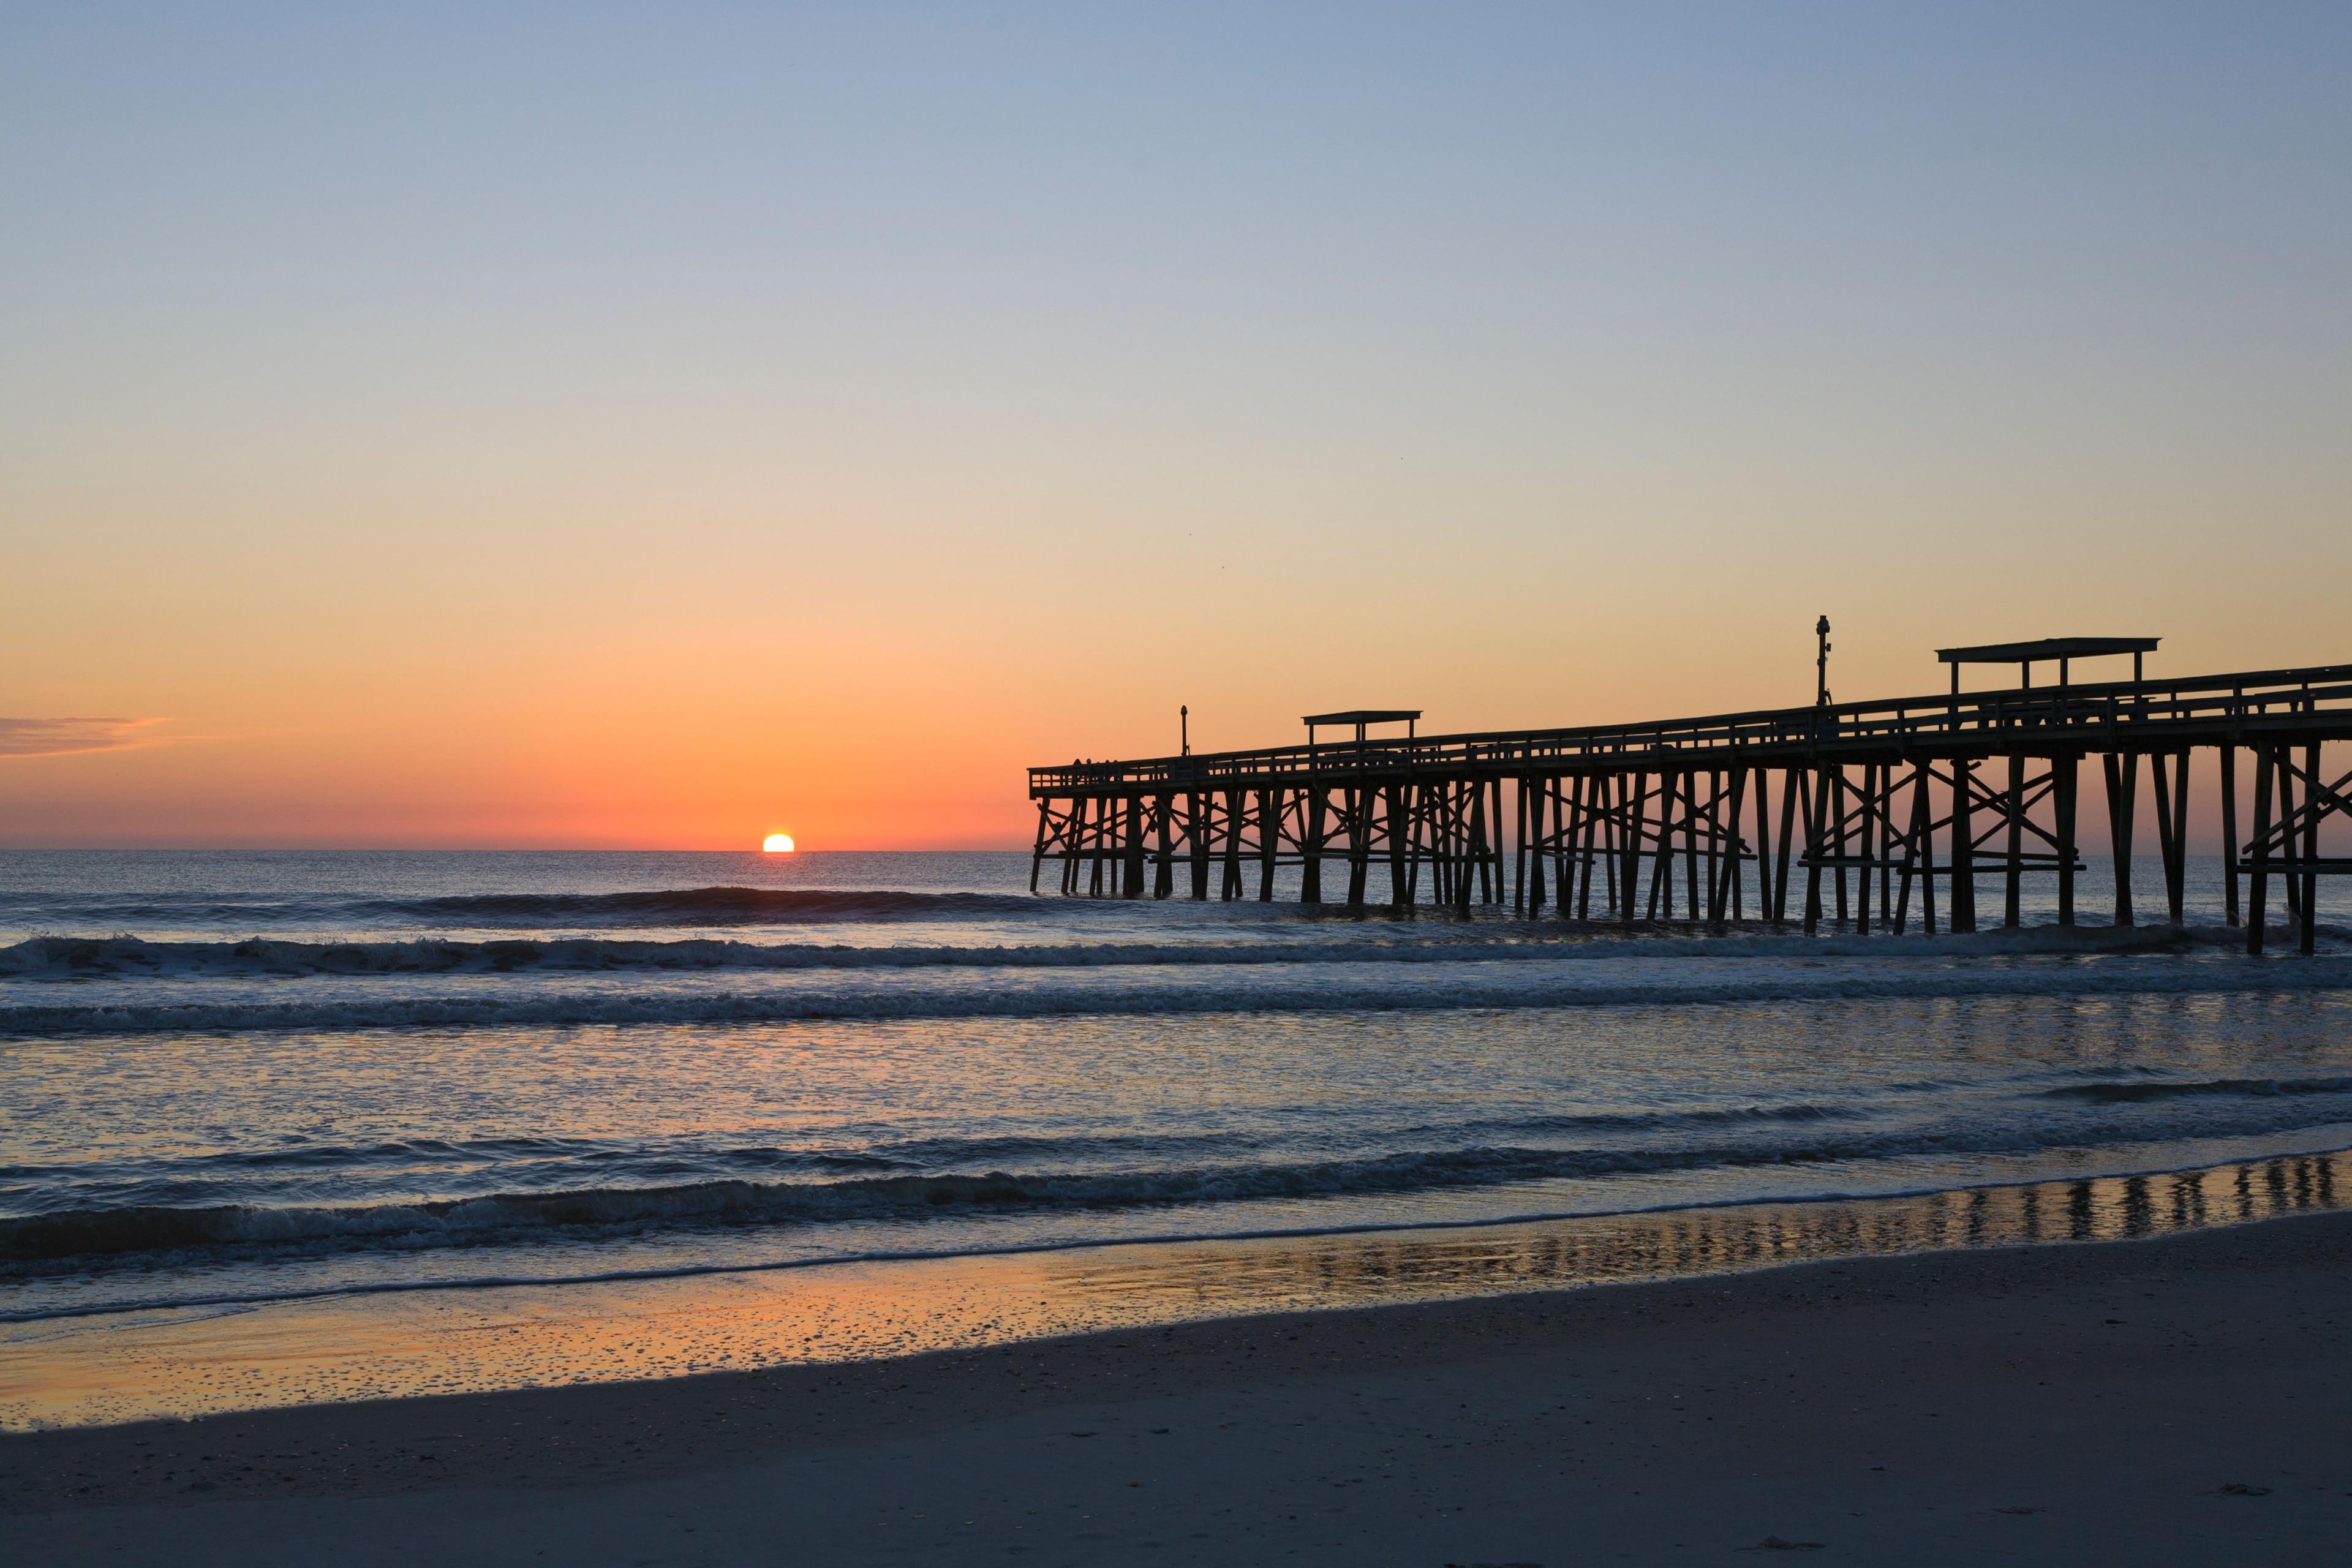 Amelia Island, Fernandina Beach Vacation Rentals: house rentals & more